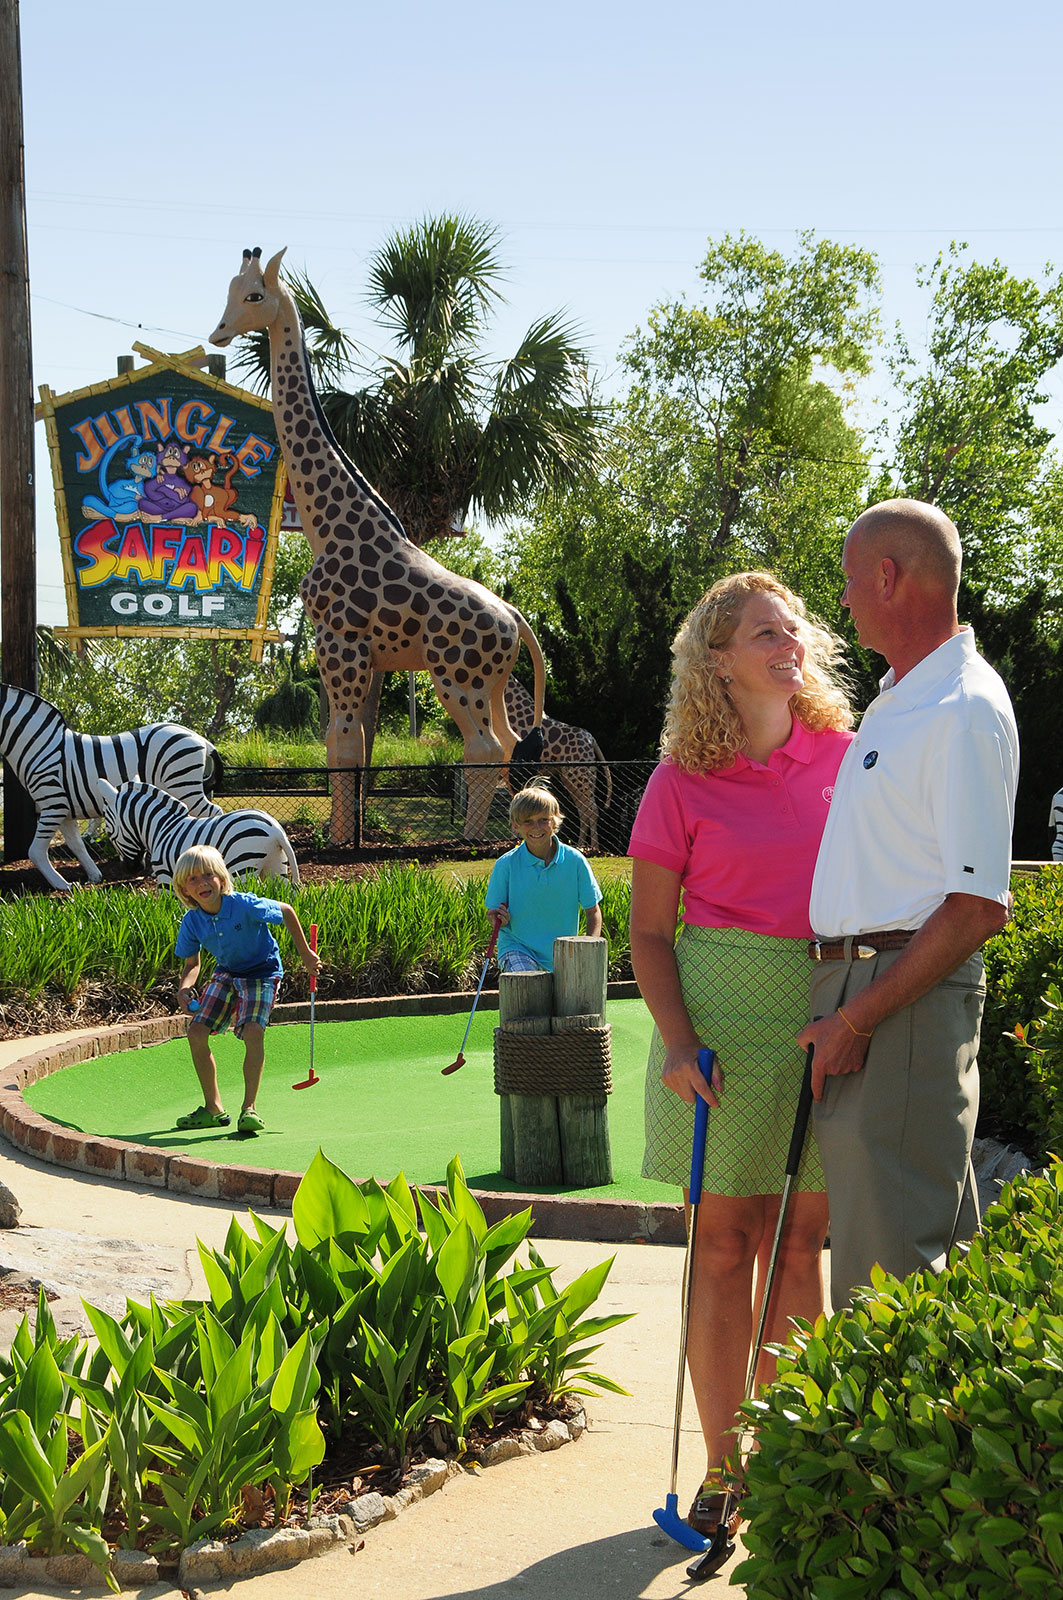 Jungle Safari - Myrtle Beach Family Golf - Myrtle Beach, SC